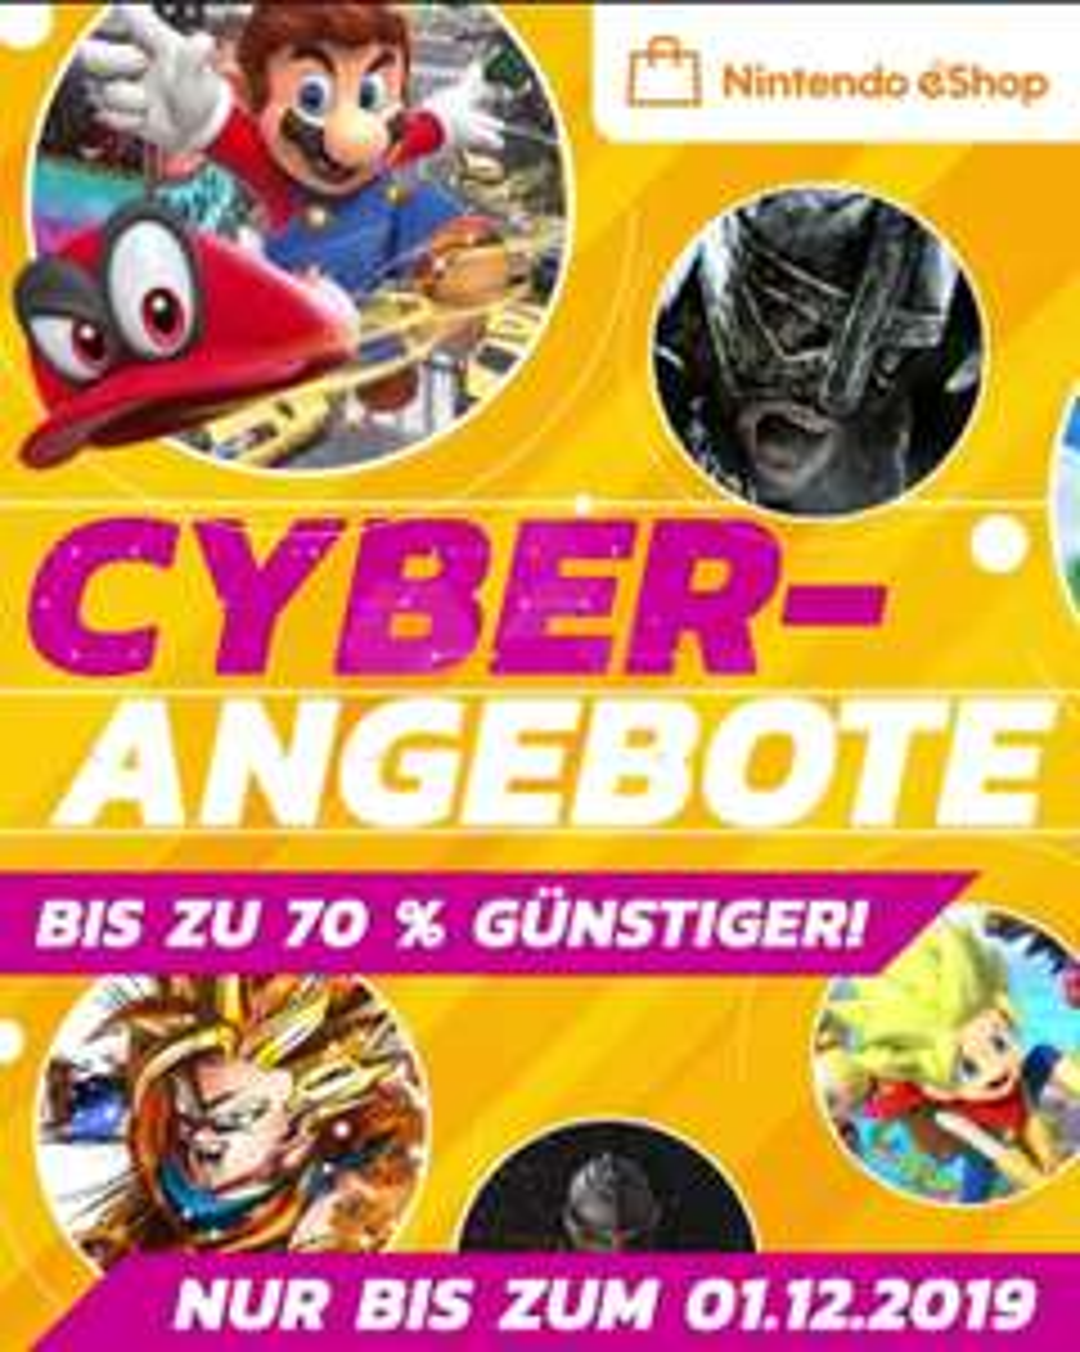 Nintendo eShop - Cyber-Angebote